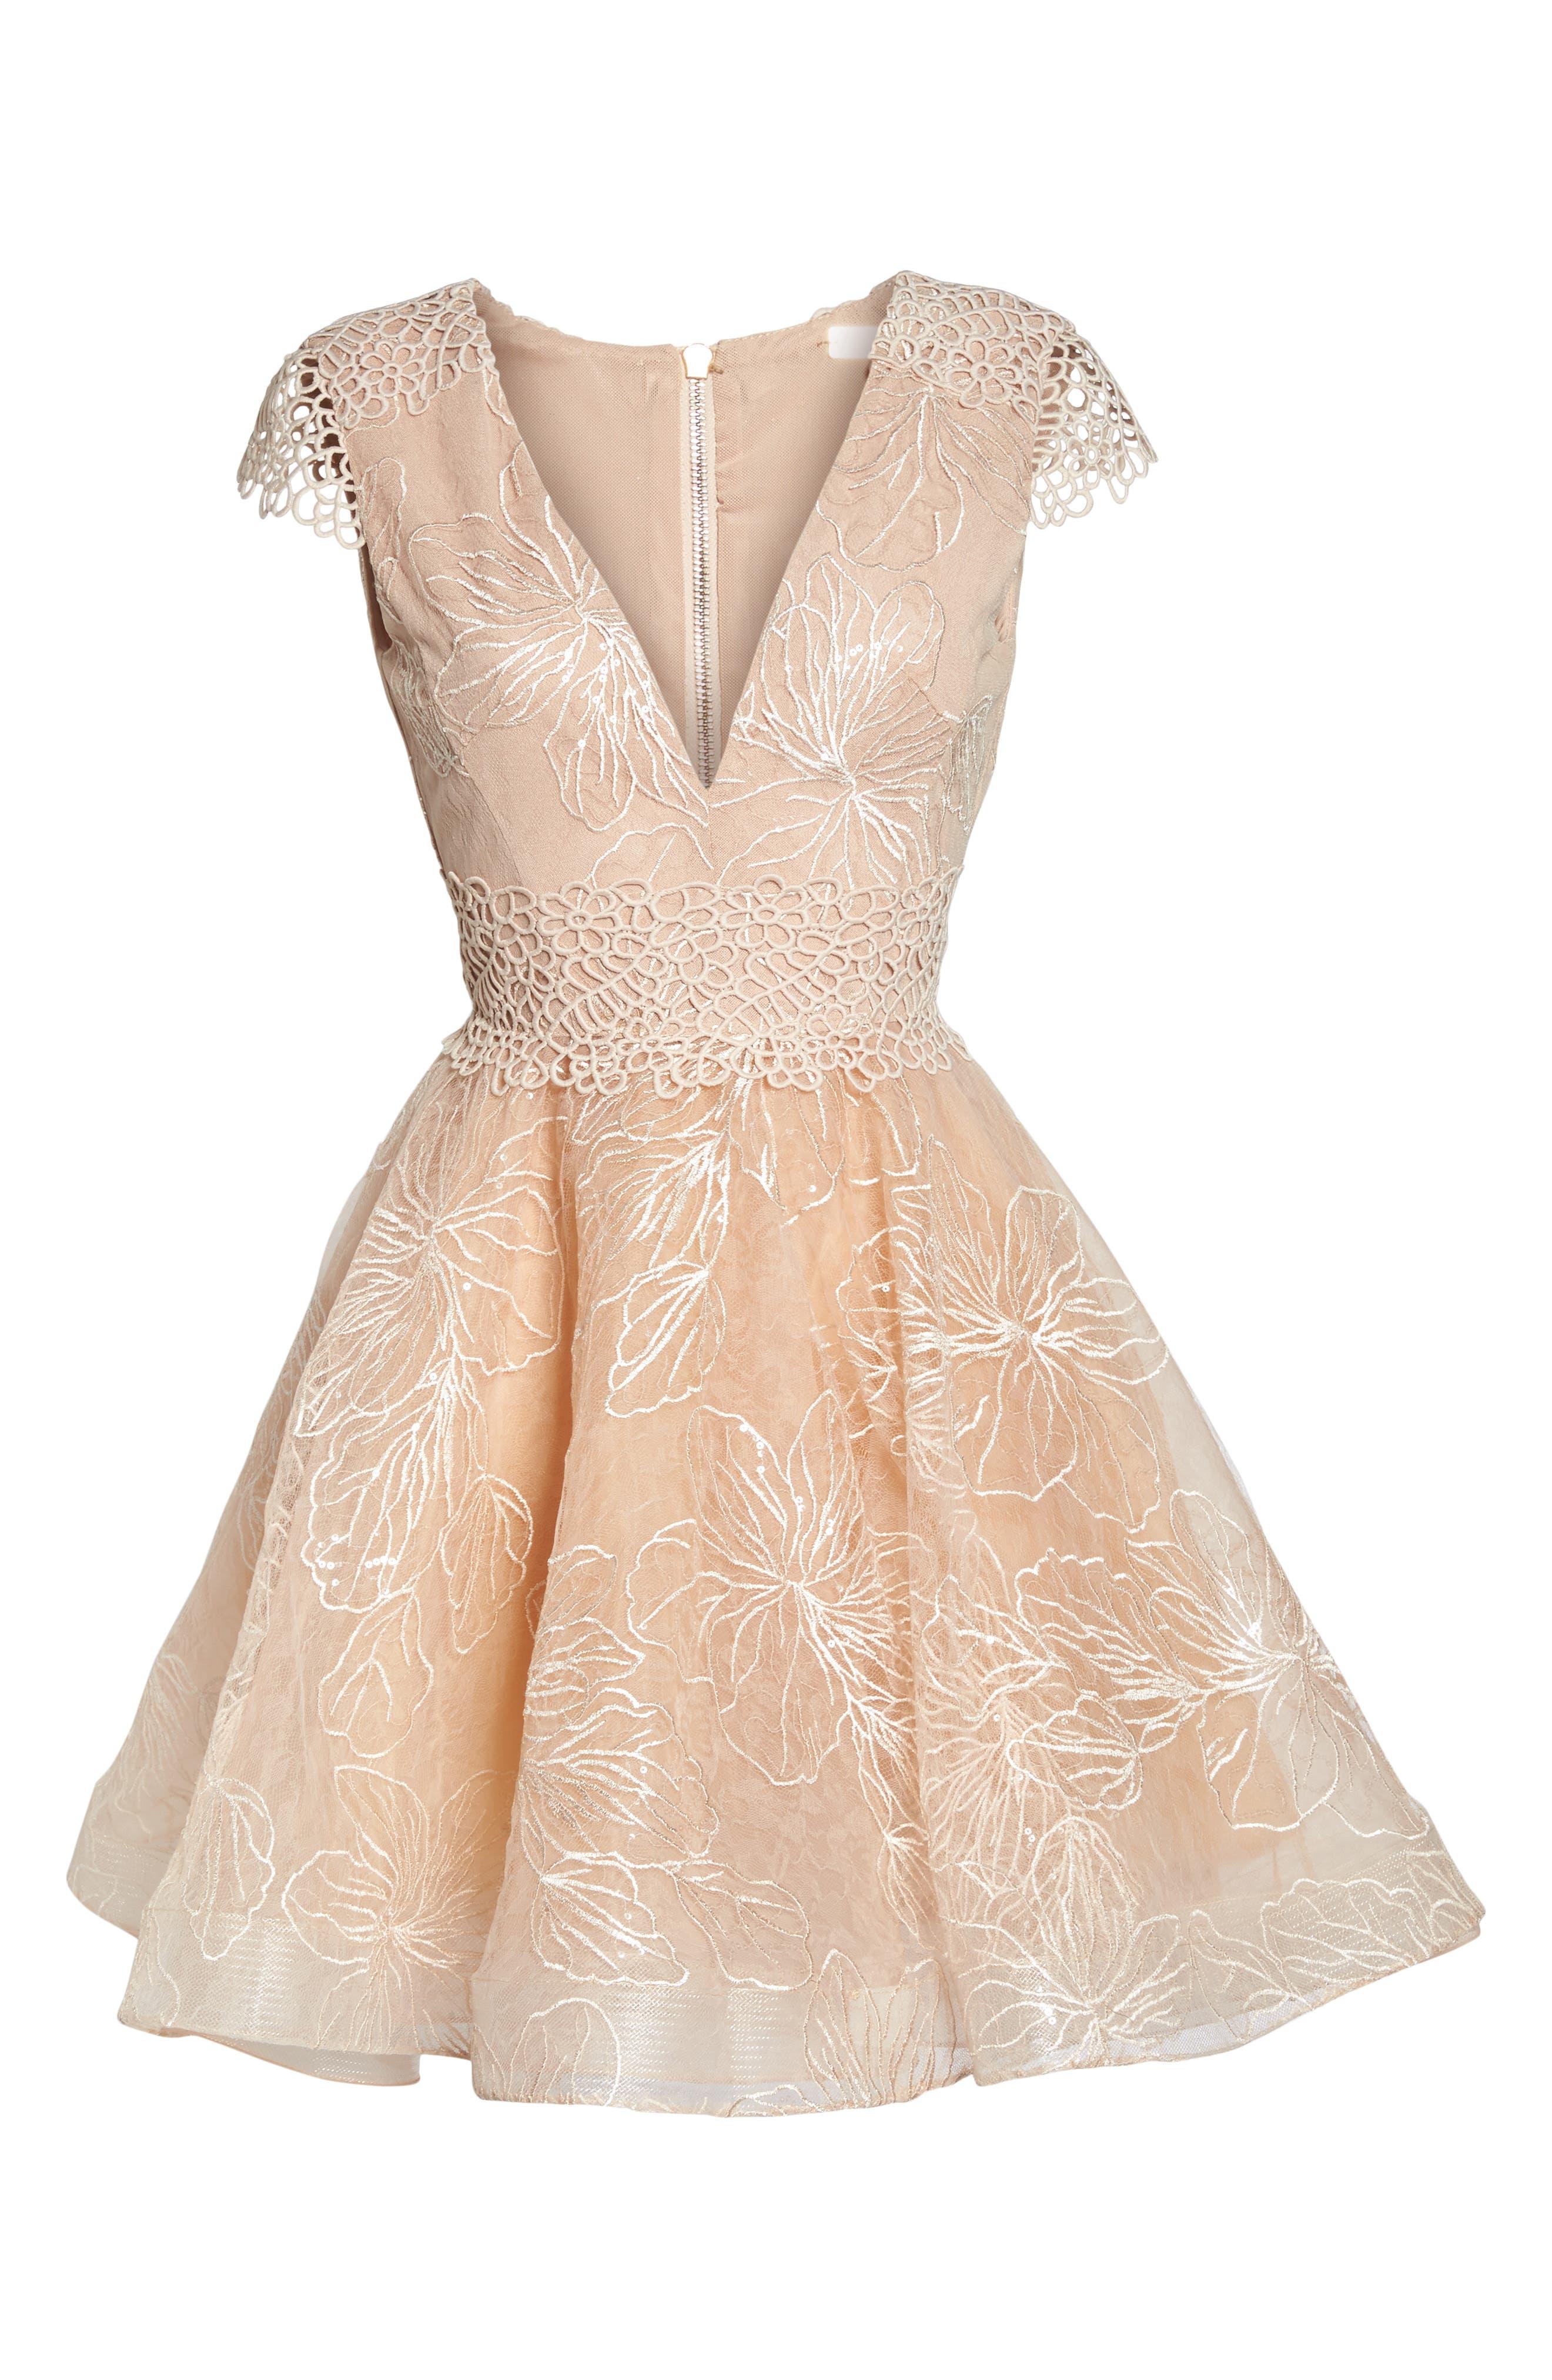 Fiore Sequin Fit & Flare Dress,                             Alternate thumbnail 6, color,                             Beige